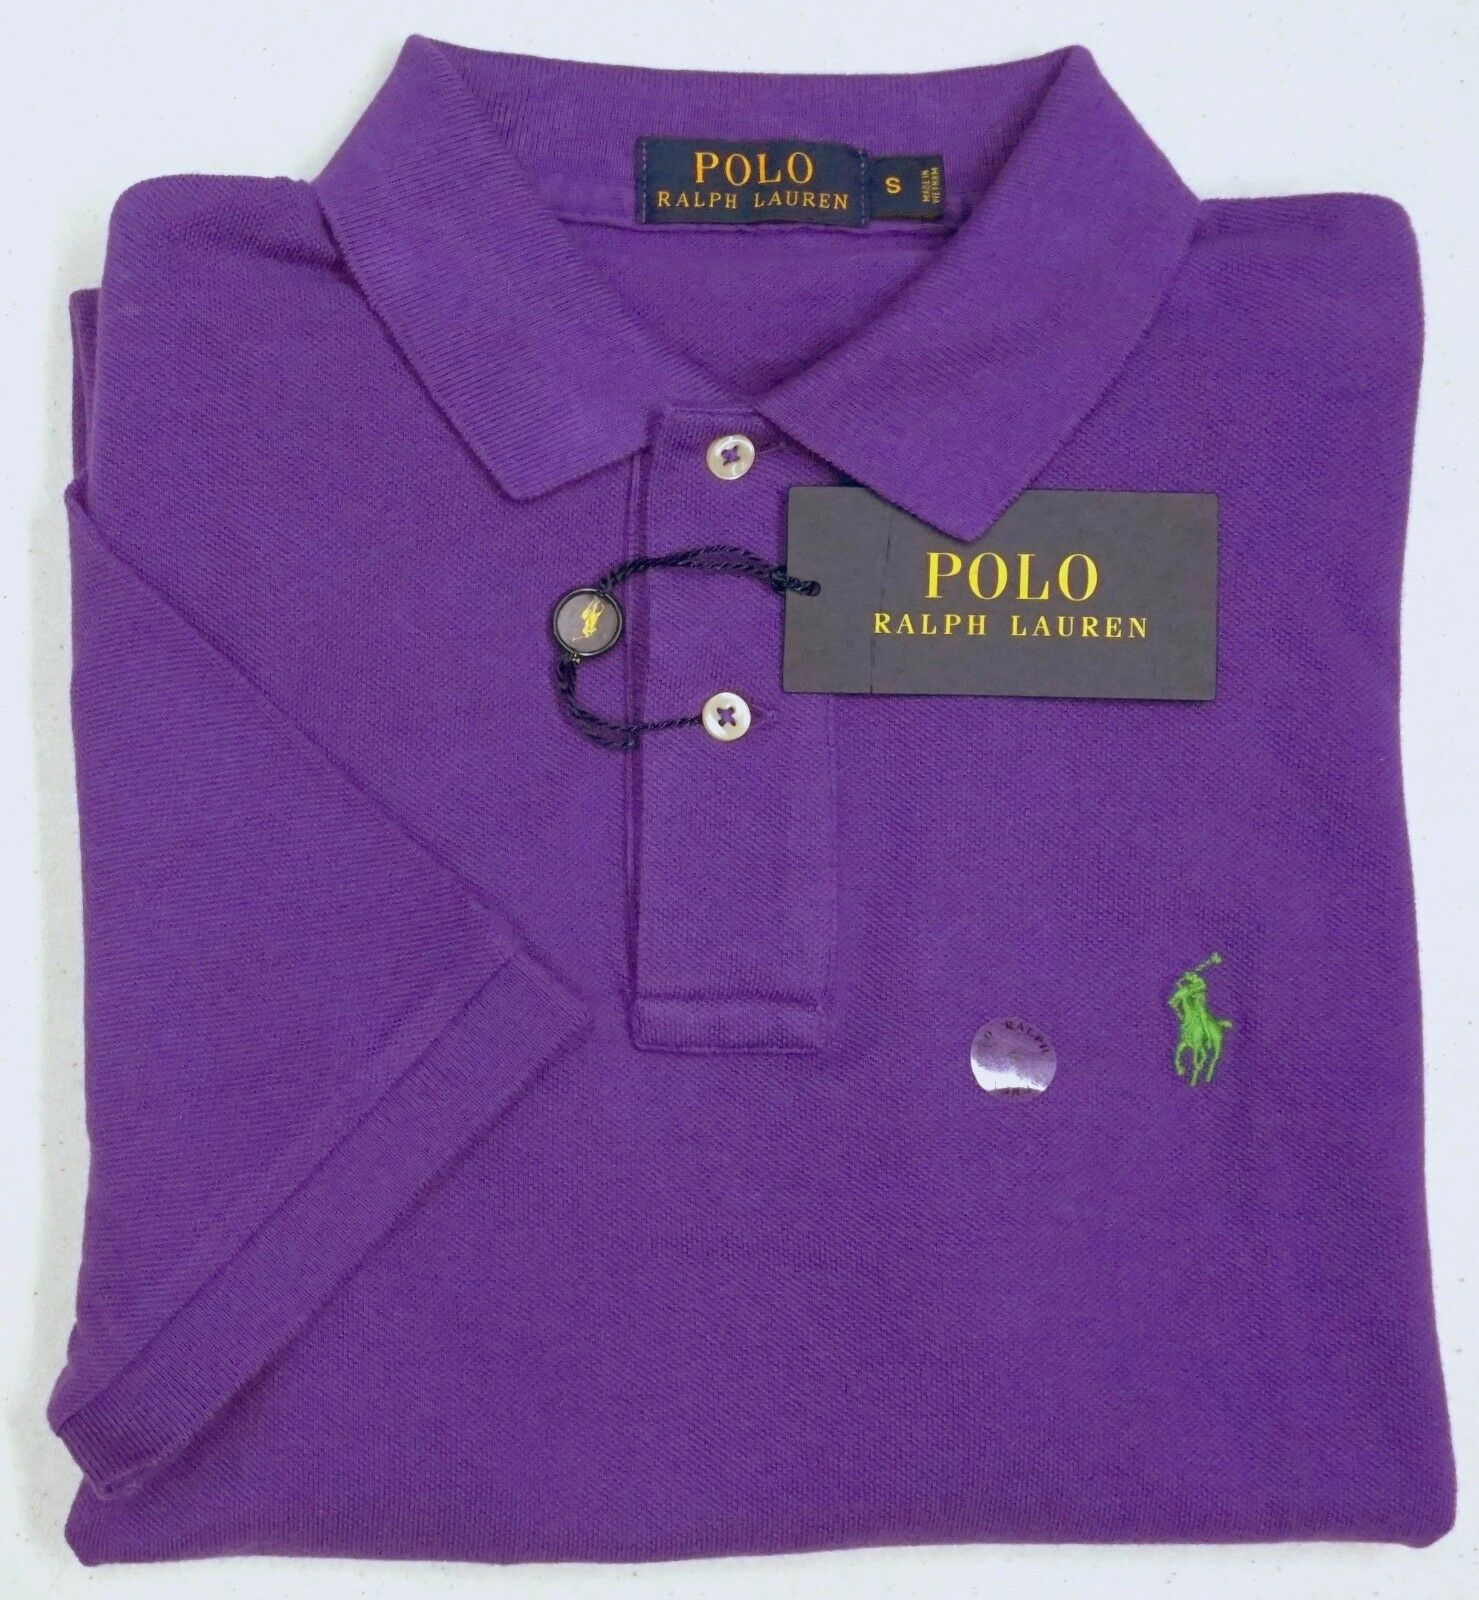 NWT  POLO Ralph Lauren Short Sleeve Mesh Vista Purple Shirt Mens Size S NEW